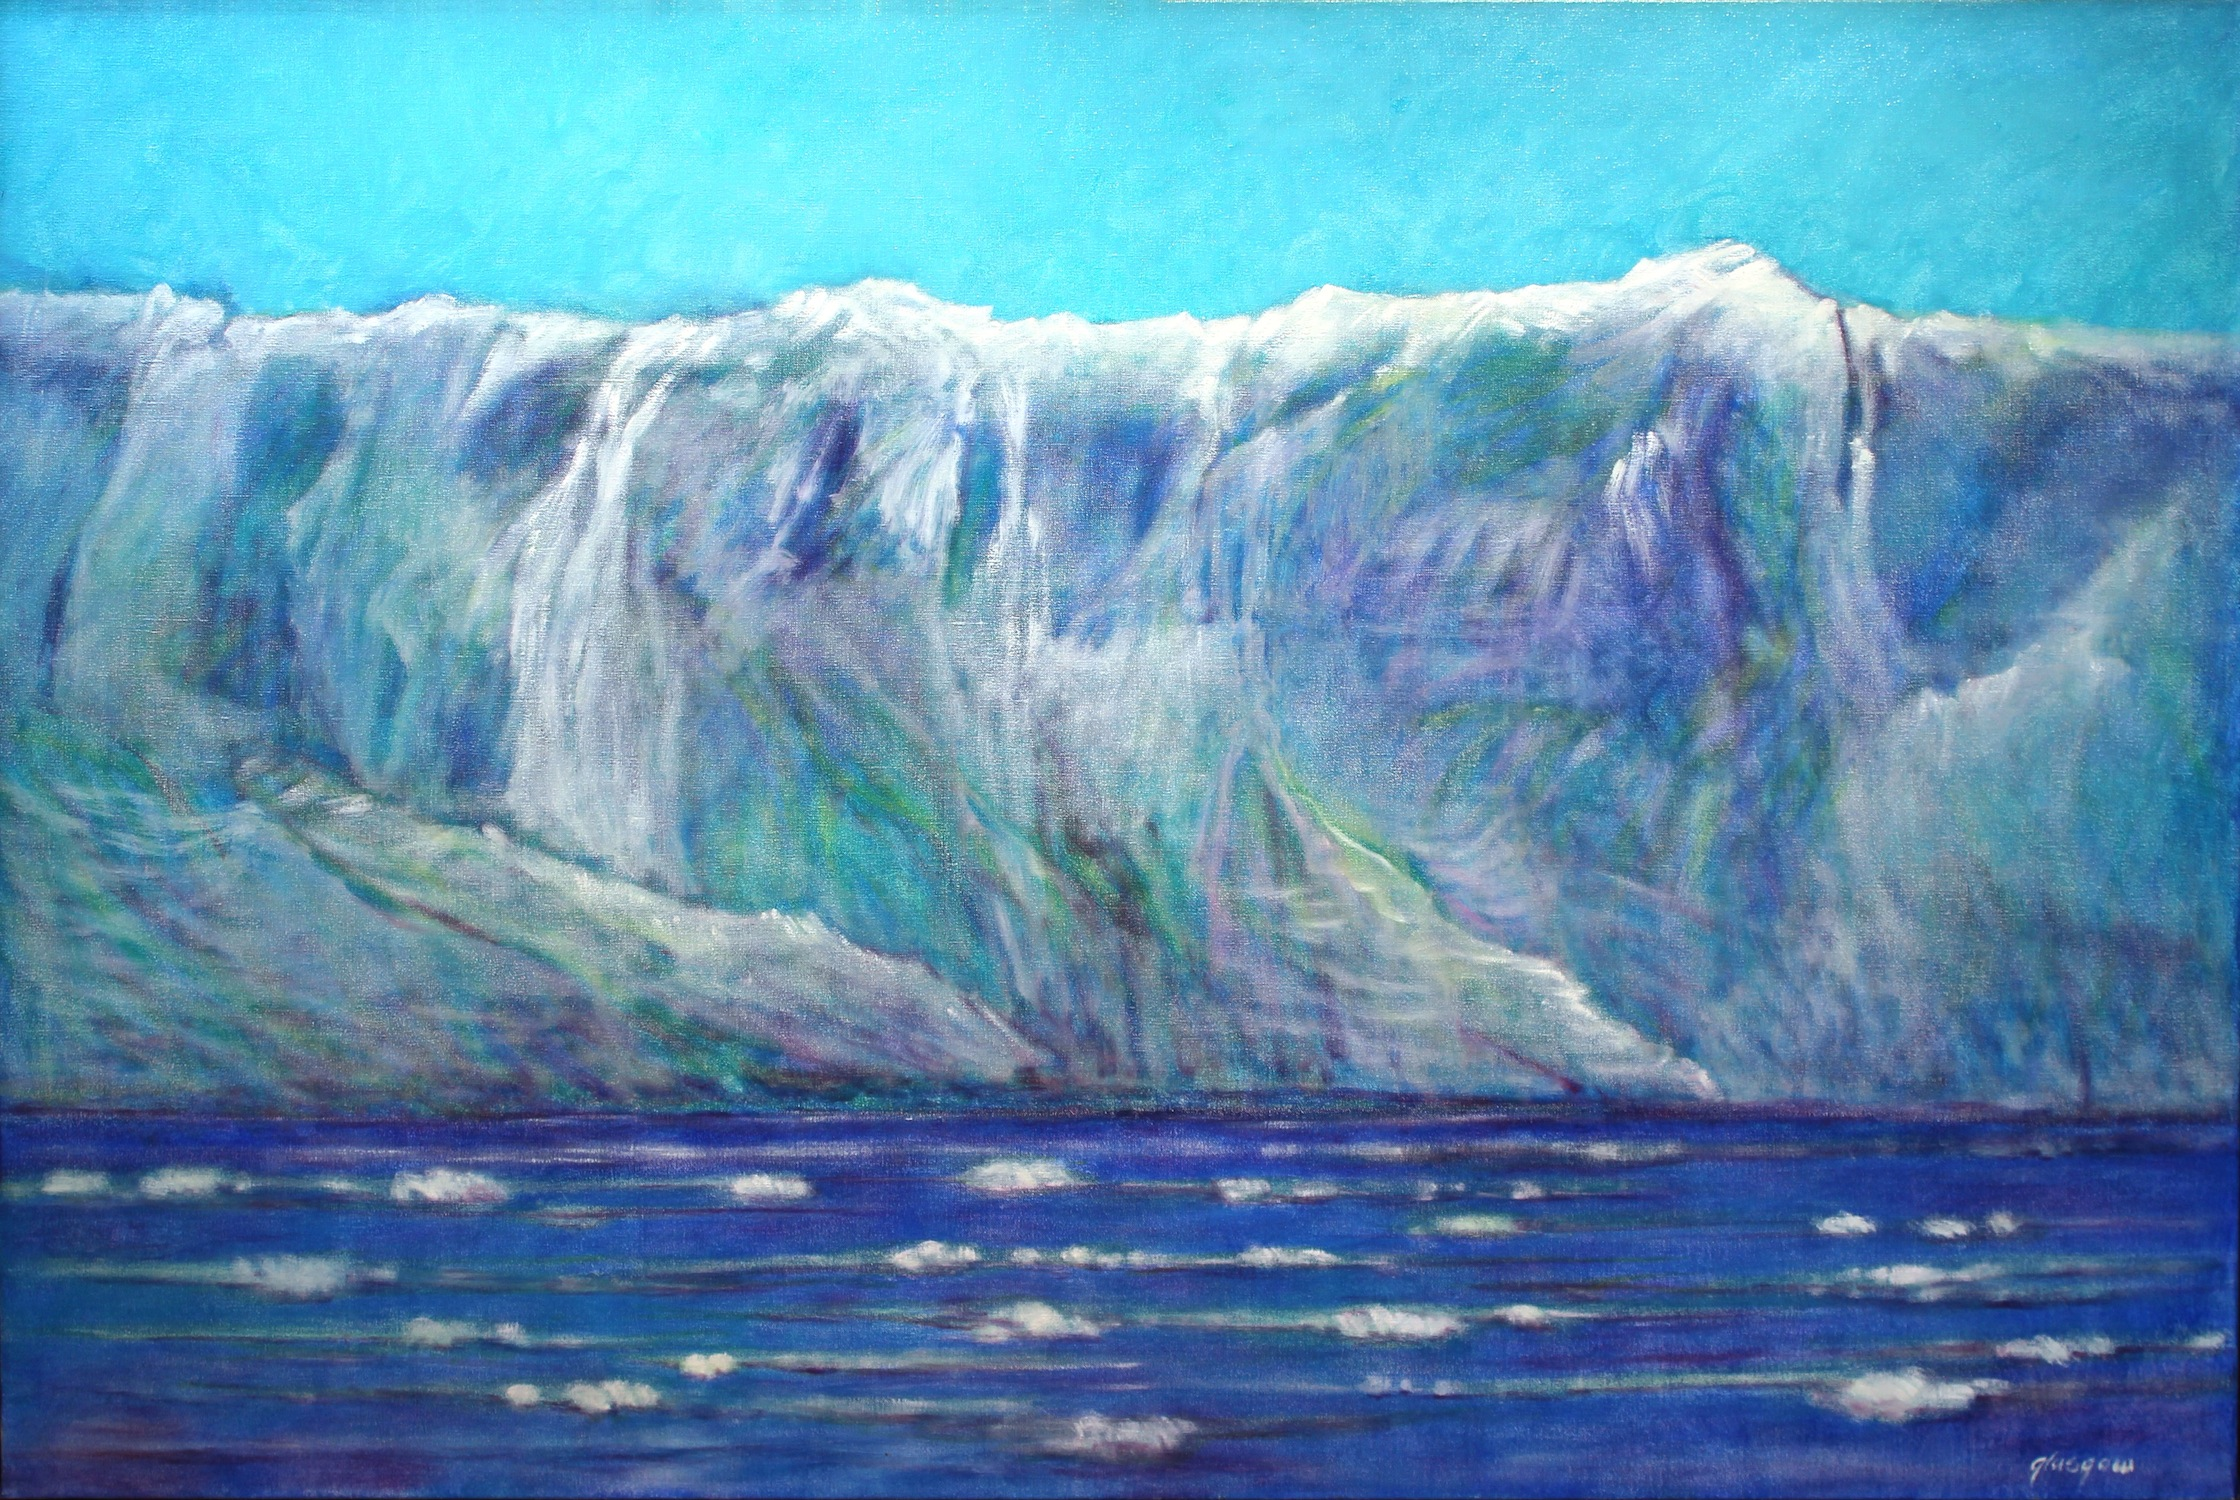 """Hubbard Glacier I,"" 2008  oil on linen  41 1/4"" x 61 1/2"""